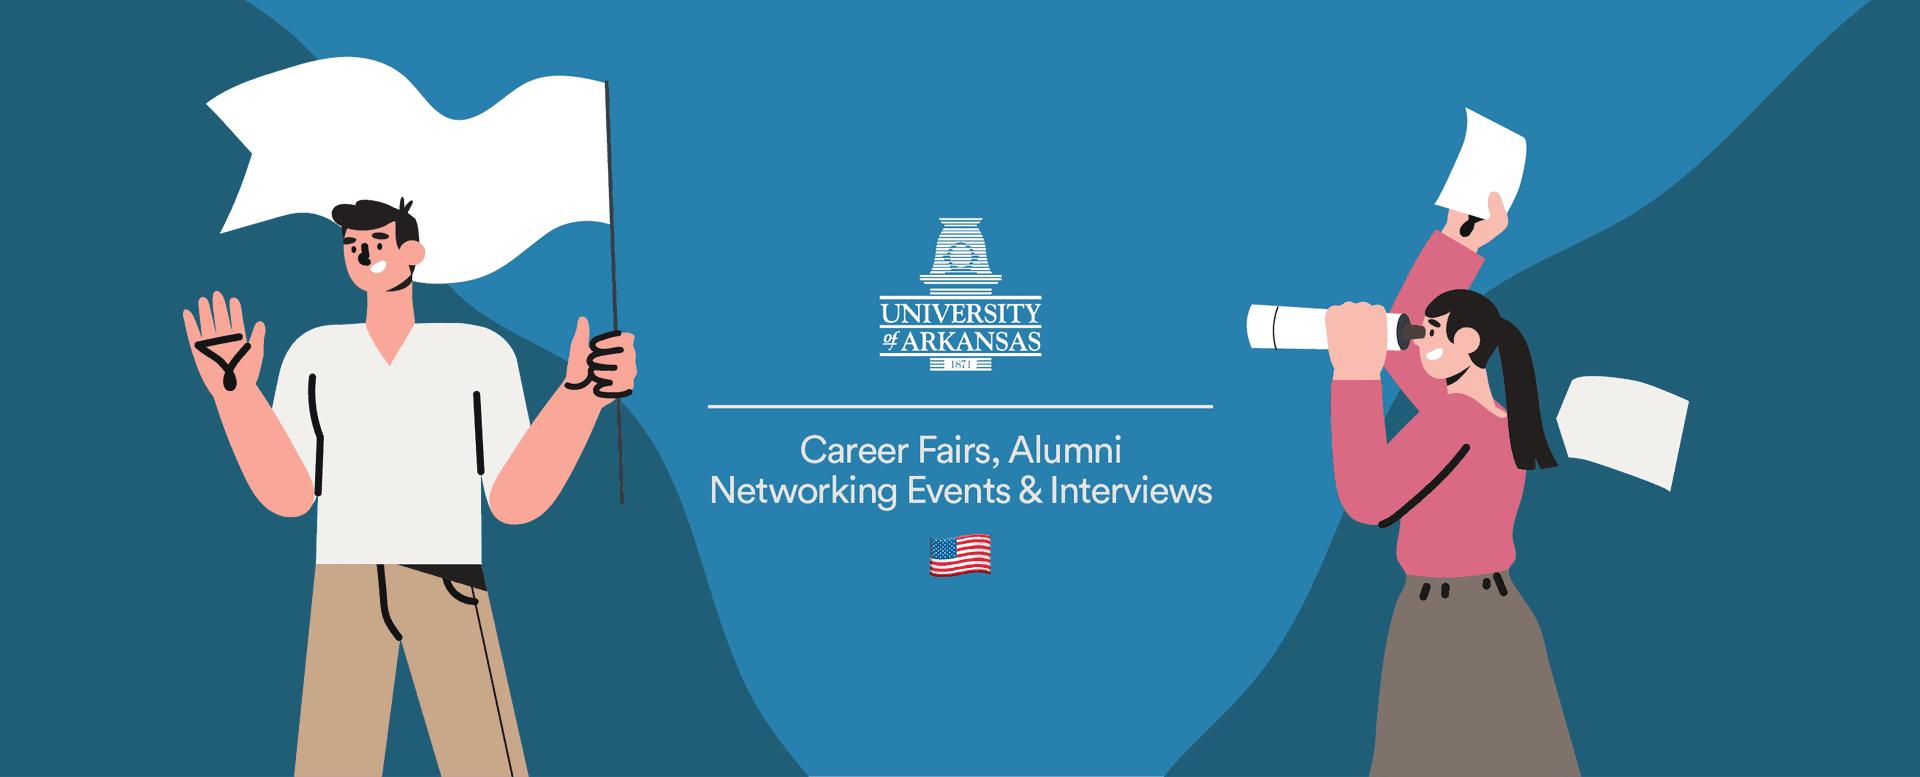 The 'University of Arkansas' hosts 5 career fairs, 4 mixers & 600 mock interviews virtually via Airmeet